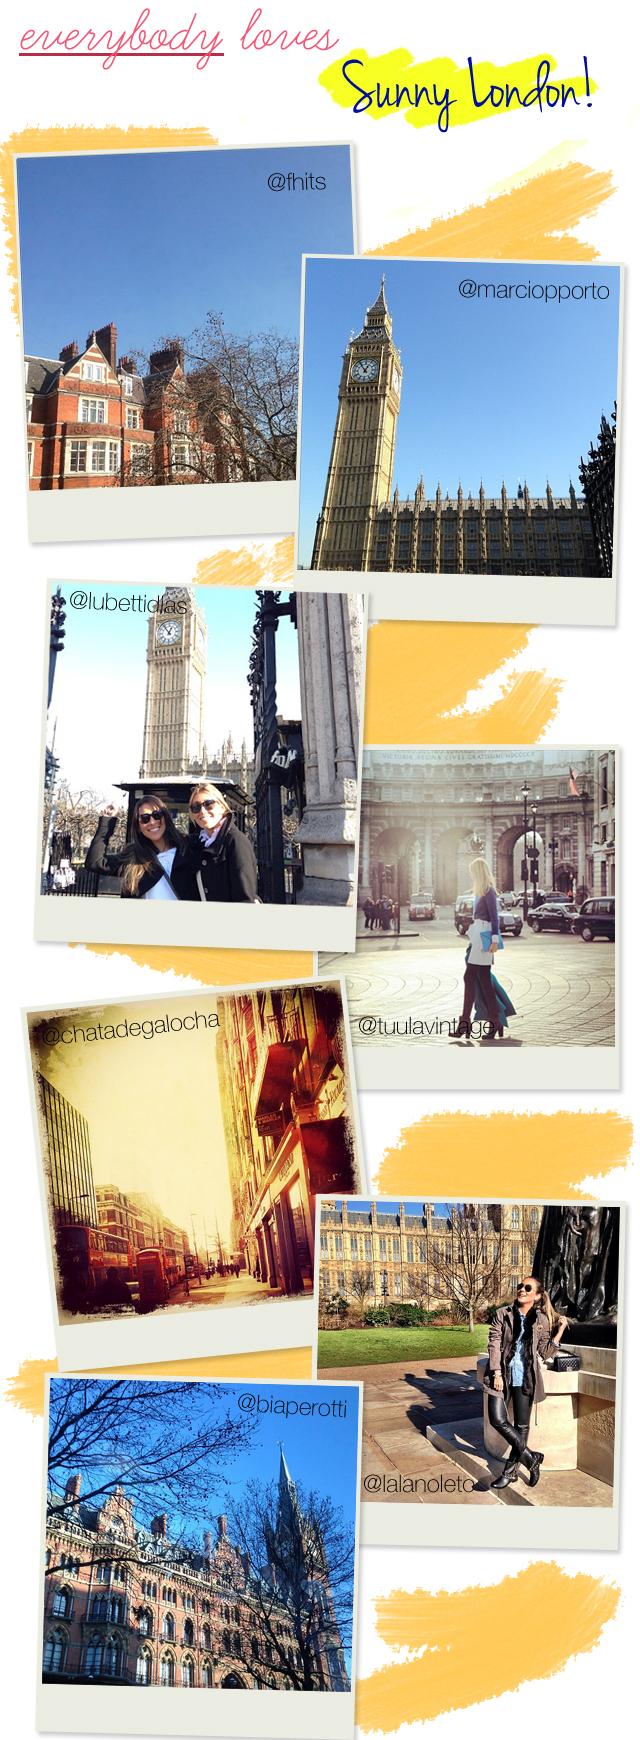 blog-da-alice-ferraz-sunny-london